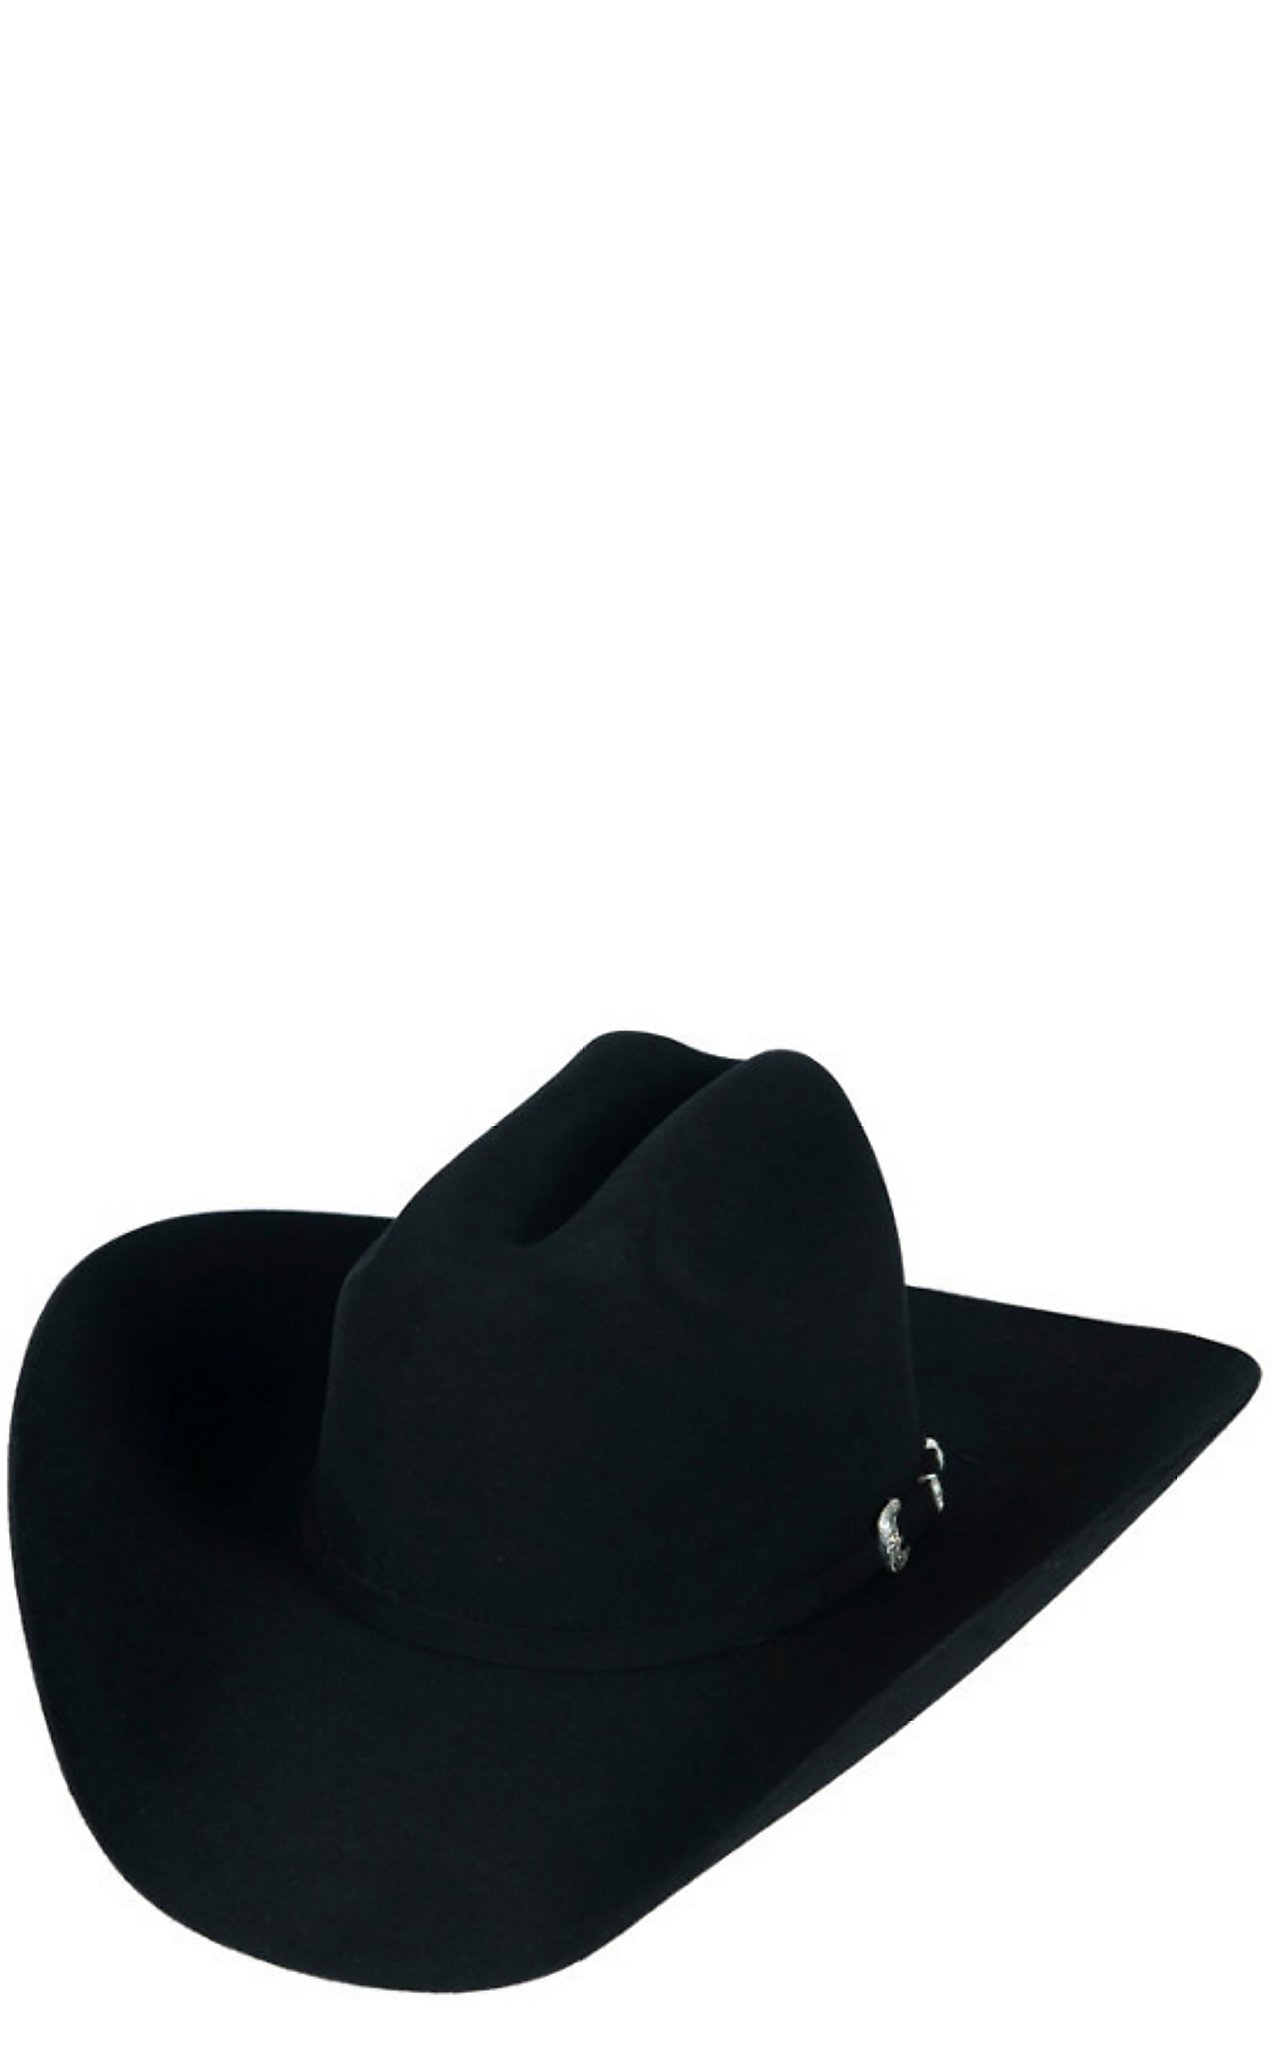 Resistol 20X Black Gold Low Crown Black Felt Cowboy Hat  98ff9aaeda6